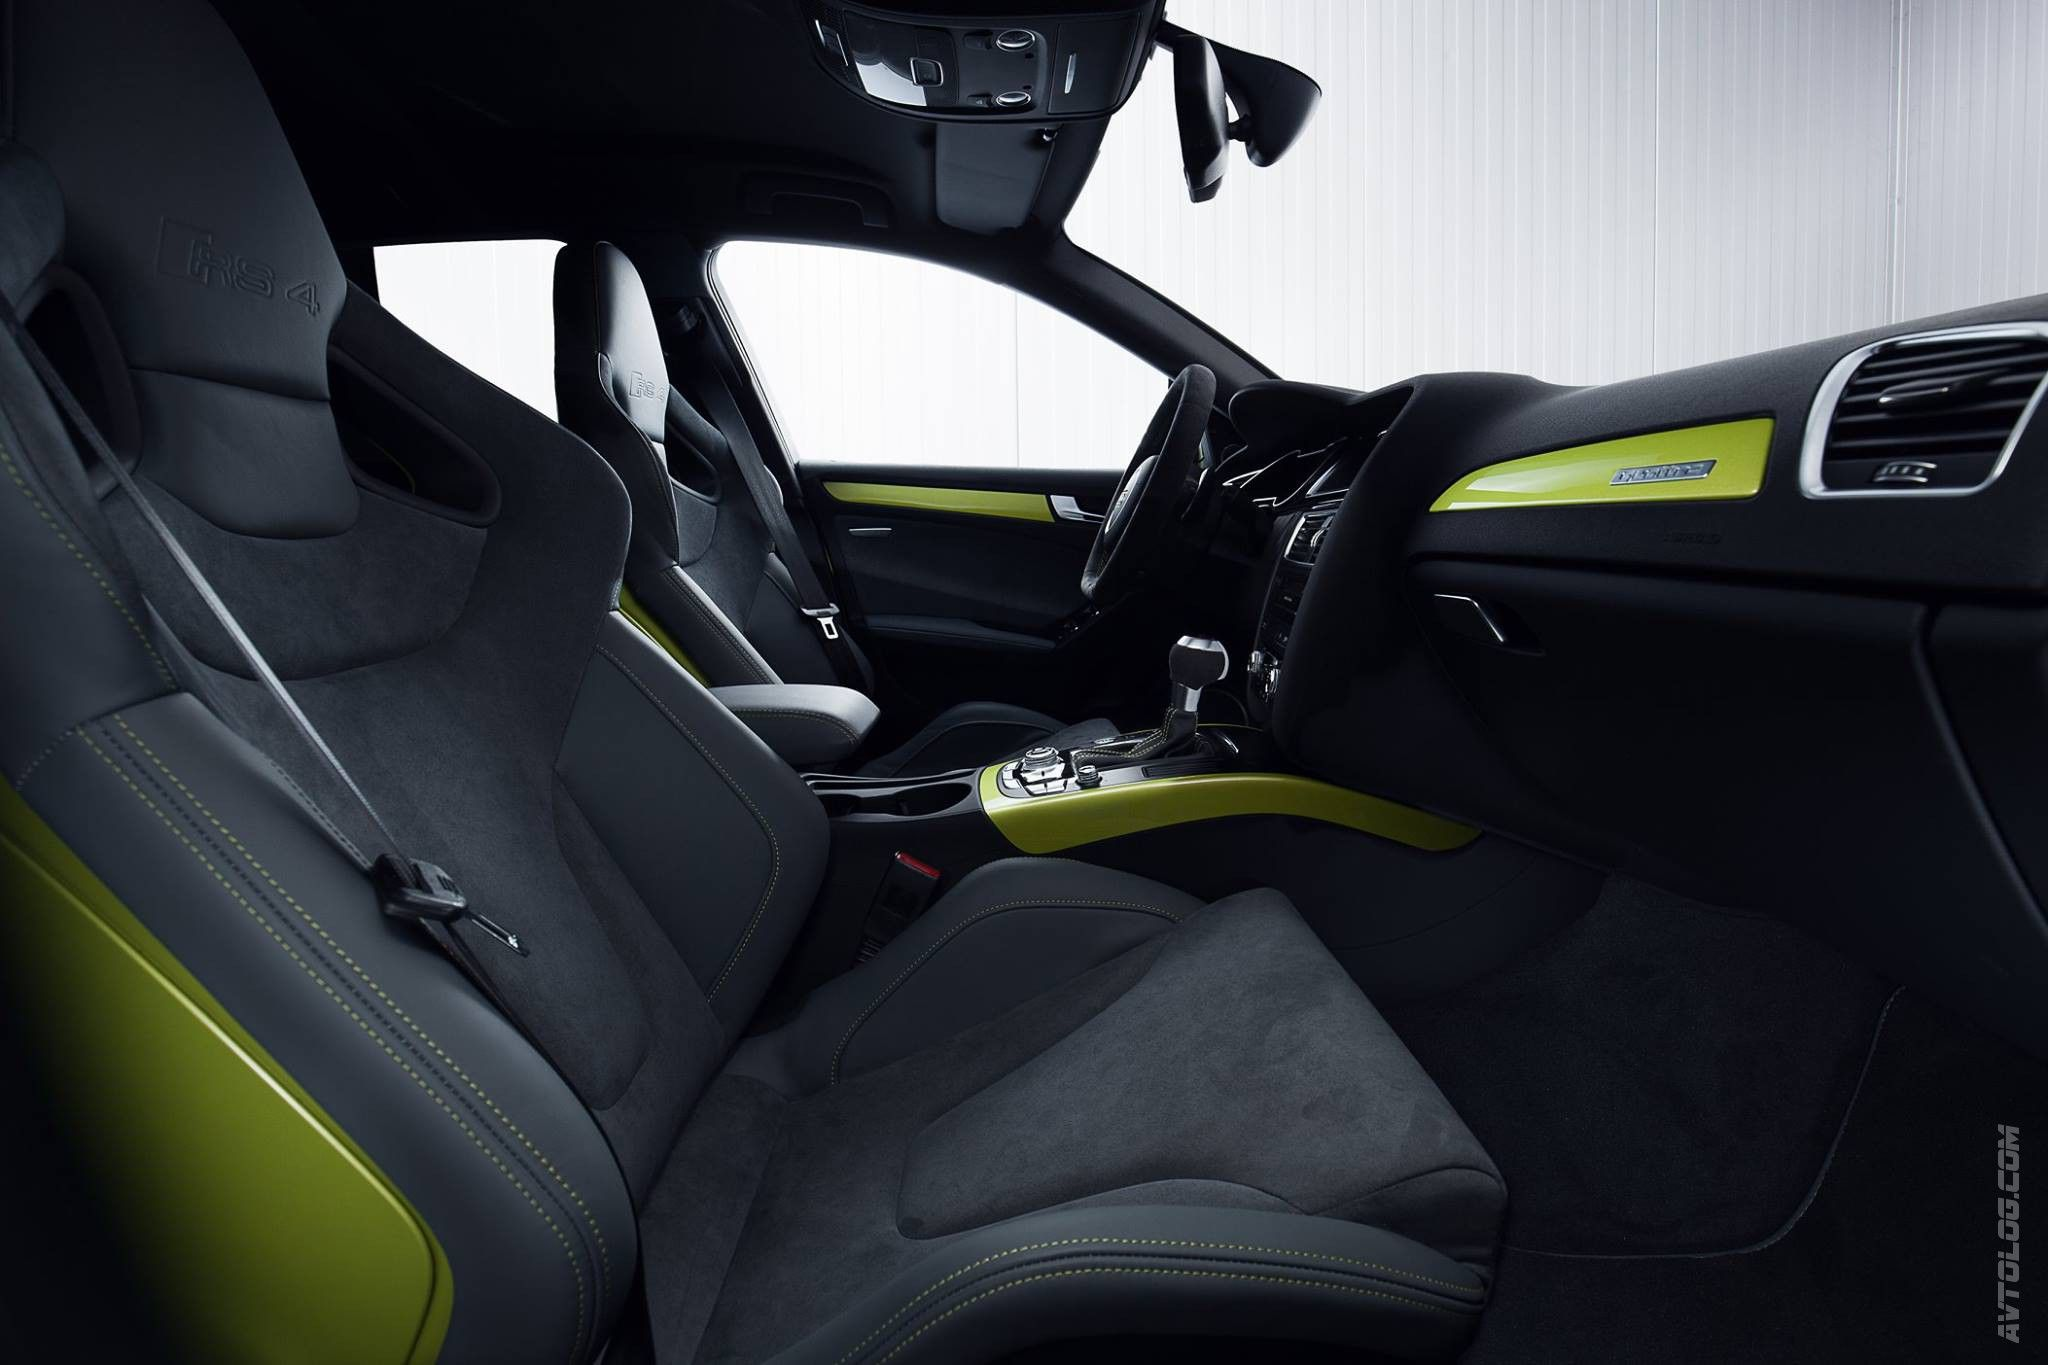 2016 Audi RS6 Avant 1 of 12 от атеРье ABT Sportsline